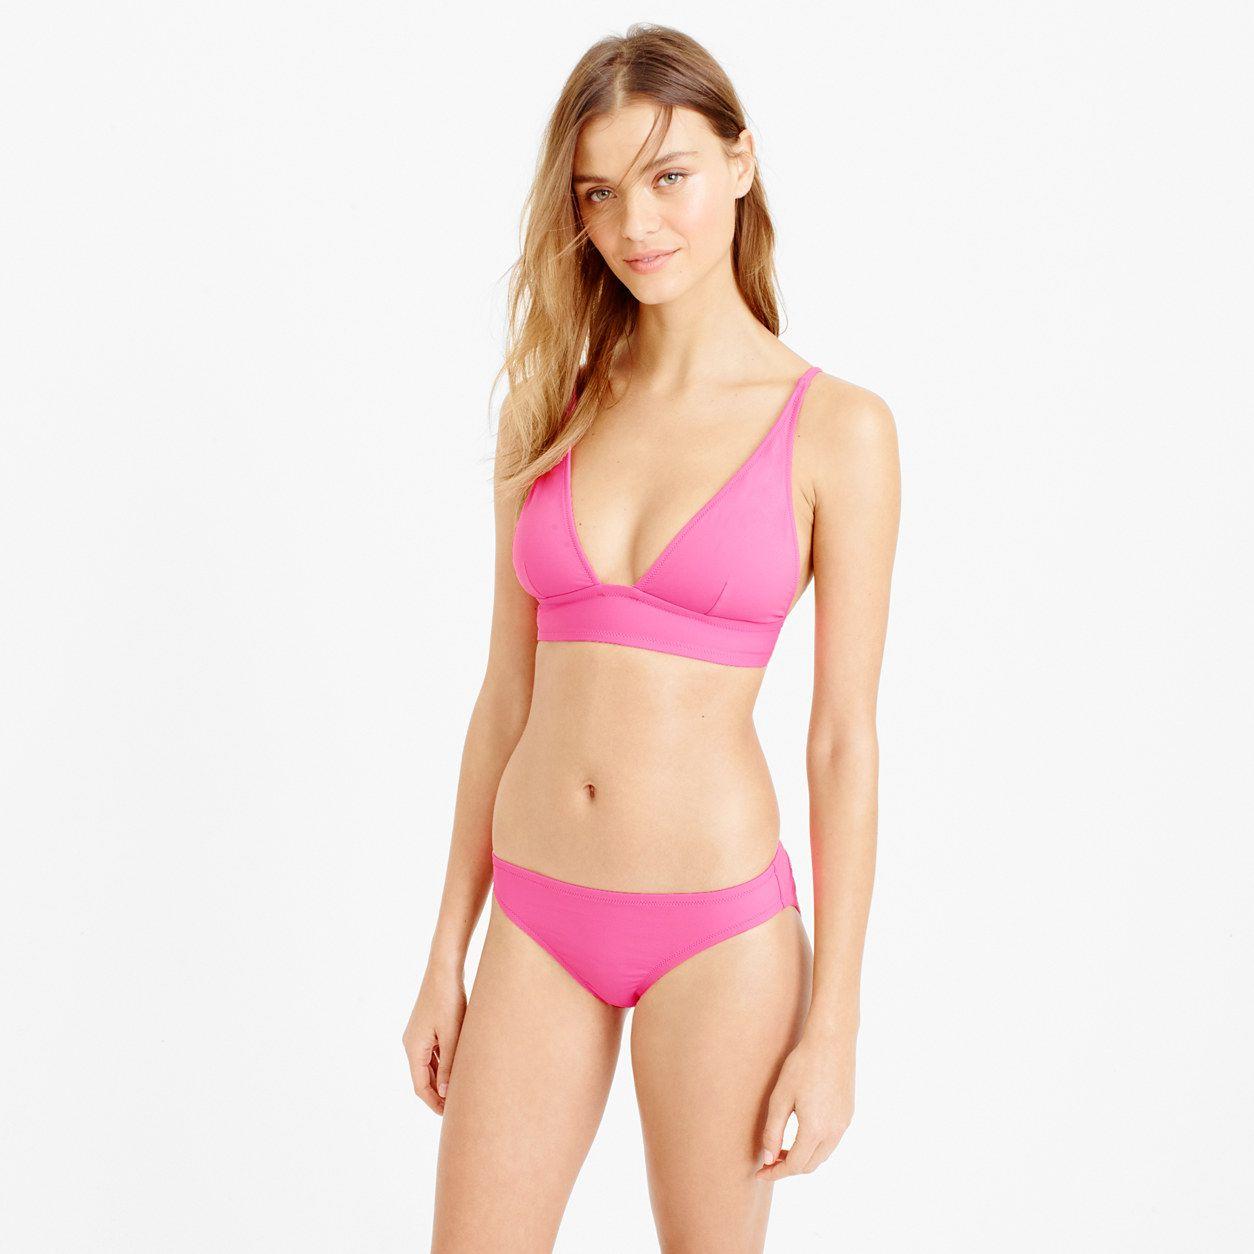 991f032058283 J.Crew Womens Plunge V-Neck Bikini Top In Italian Matte (Size S ...